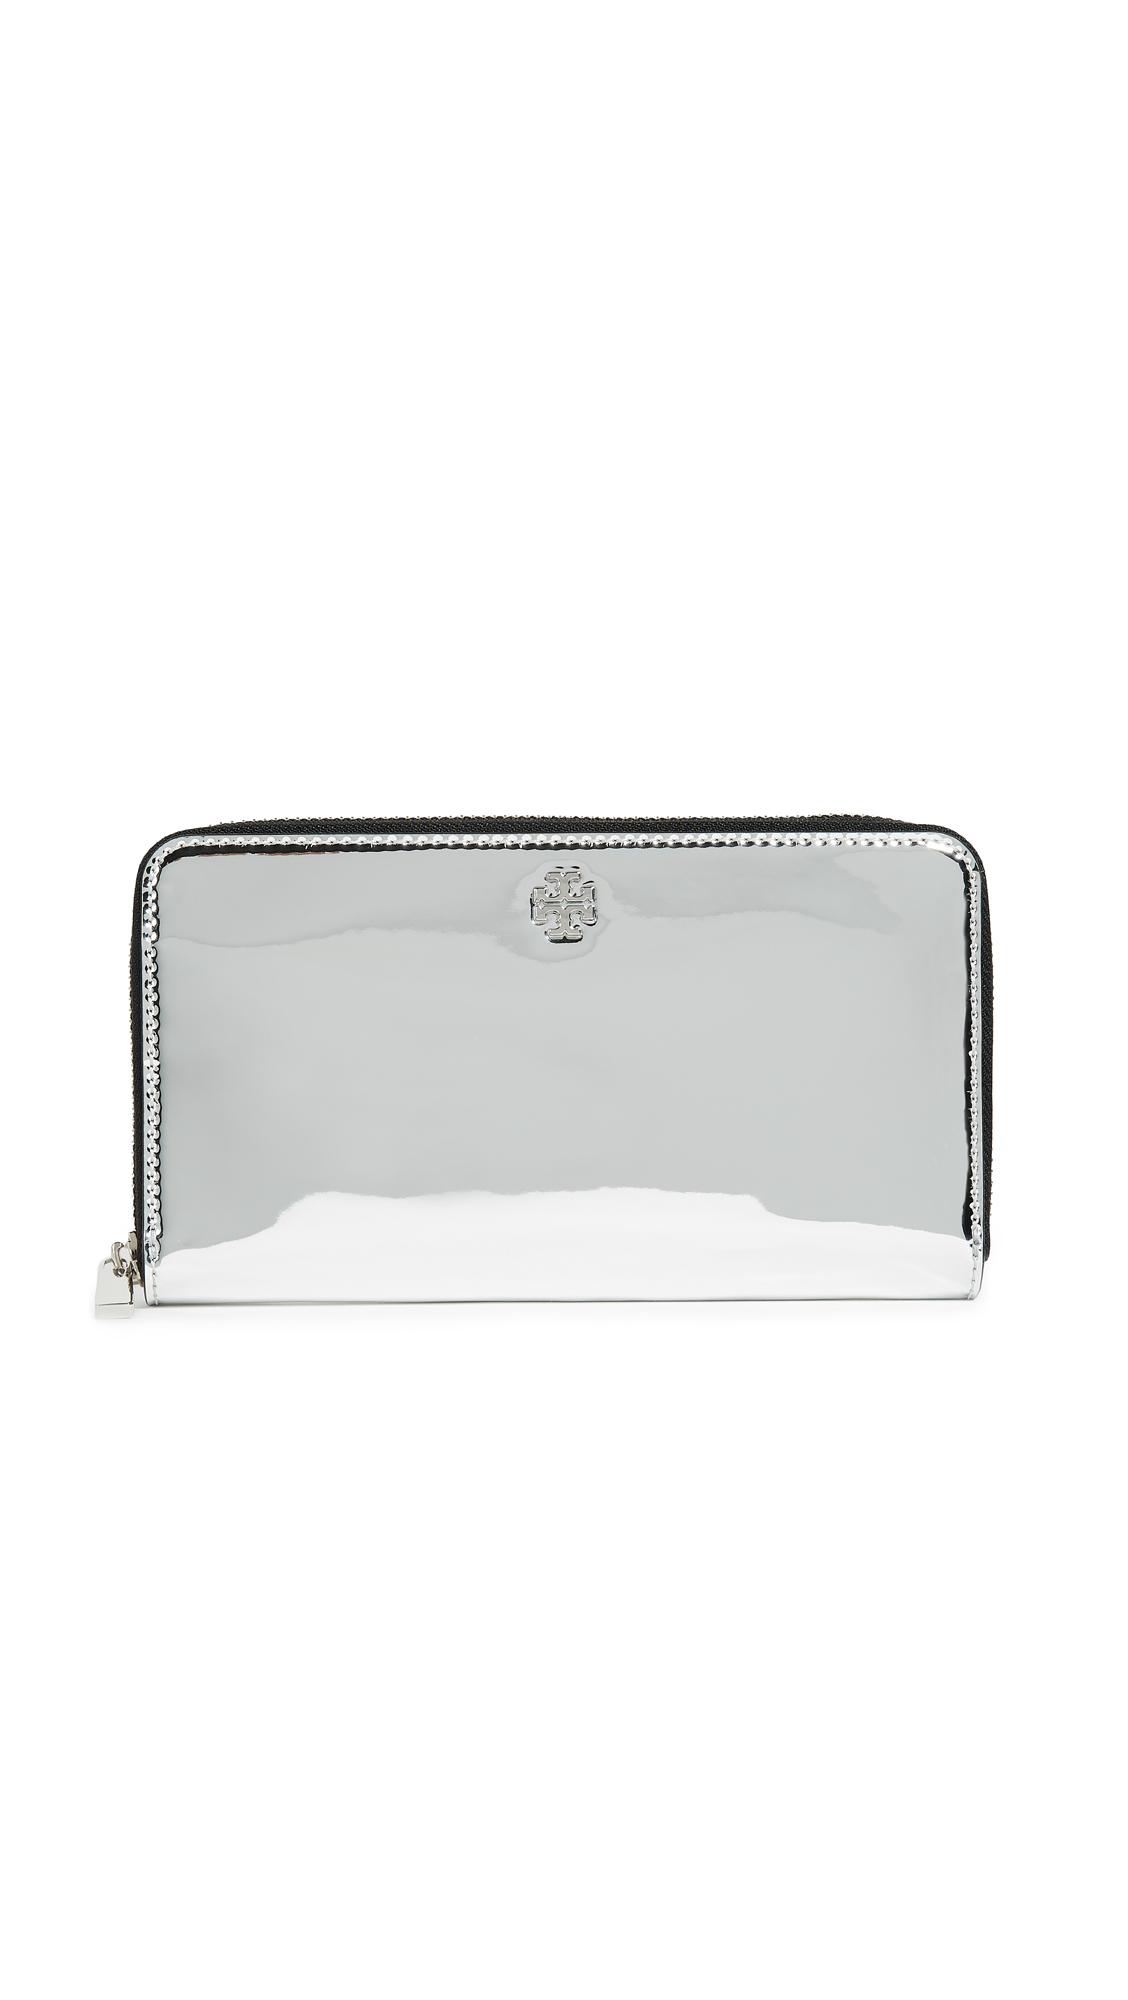 Tory Burch Robinson Zip Continental Wallet - Silver Specchio